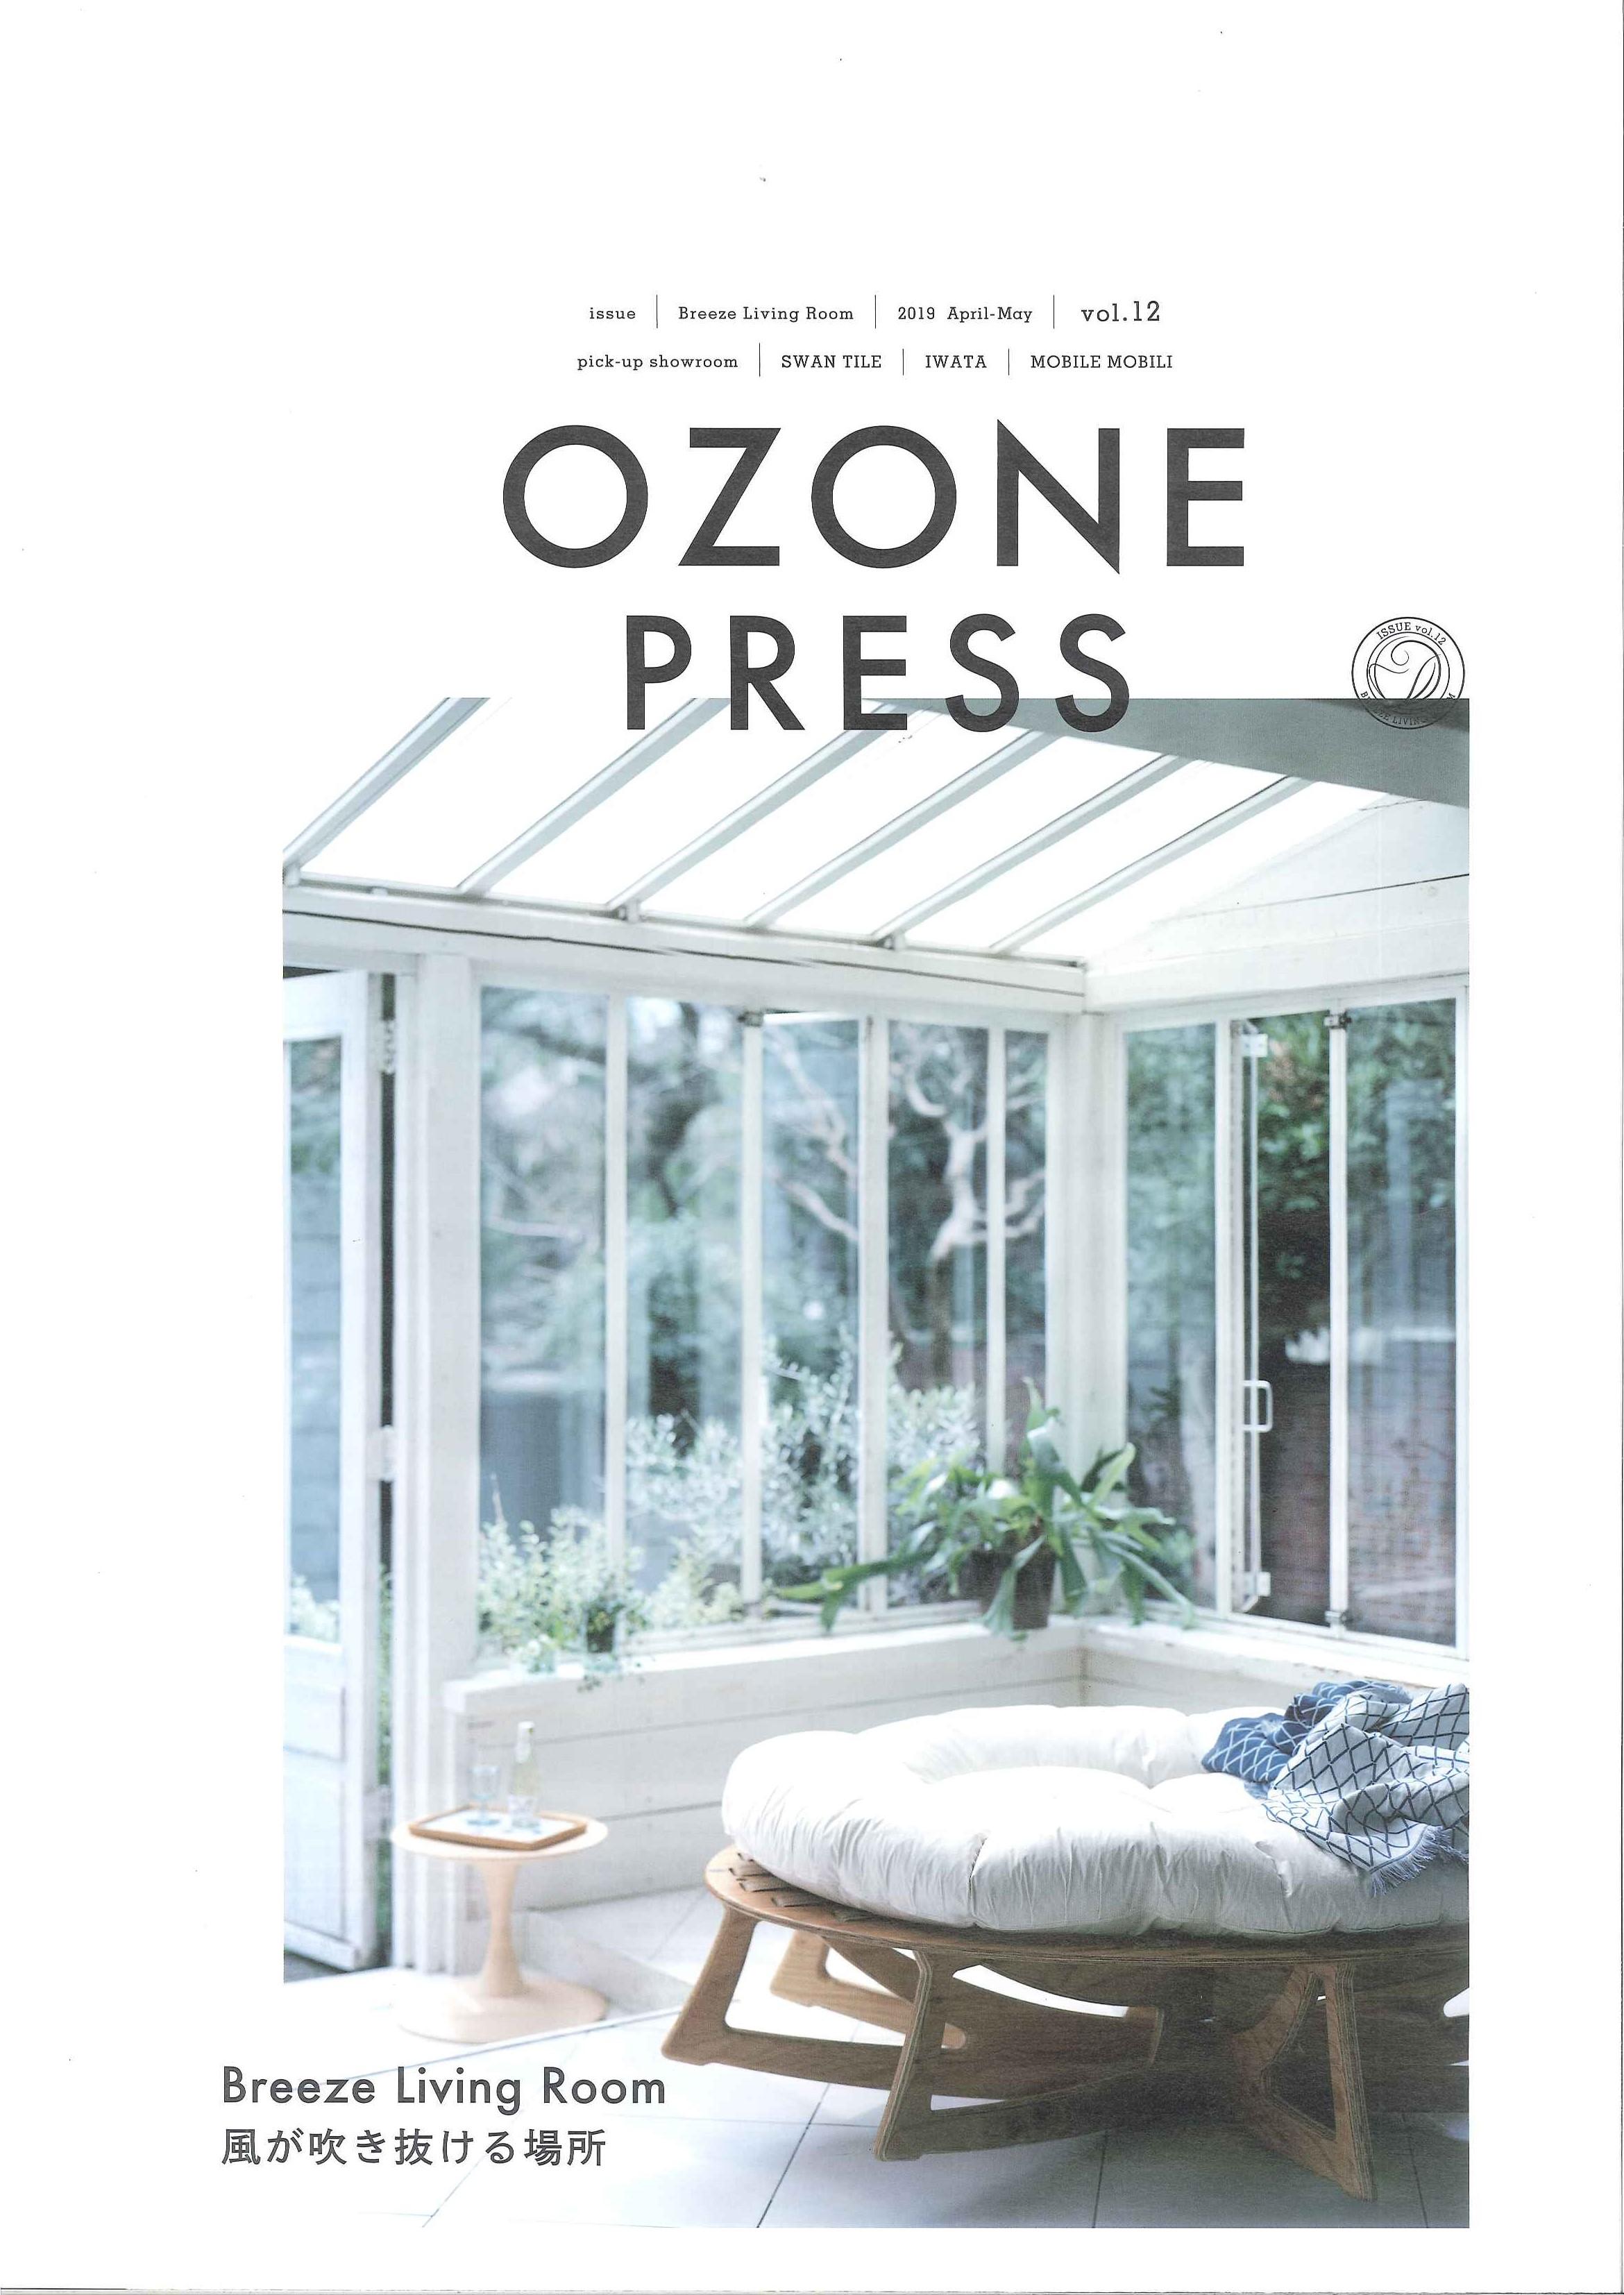 『OZONE PRESS』に人類進化ベッドが掲載されました